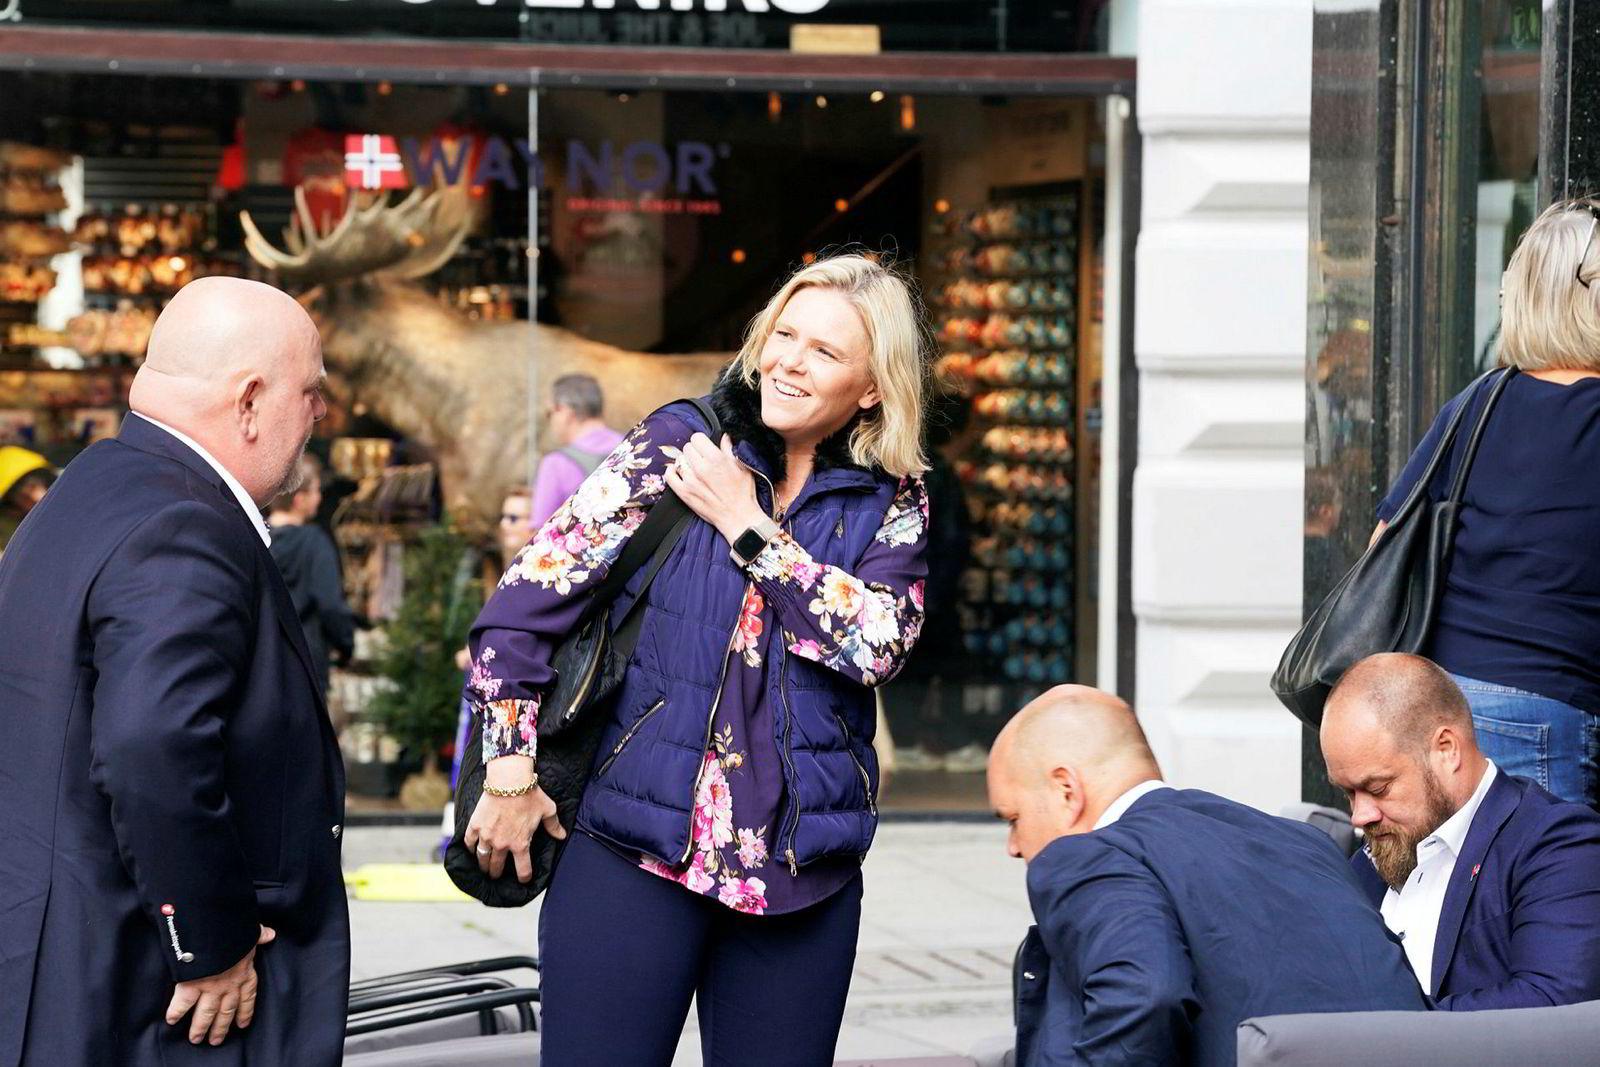 Frp-nestleder Sylvi Listhaug med partifeller før det ekstraordinære landsstyremøte i partiets lokale i Karl Johans gate 25.